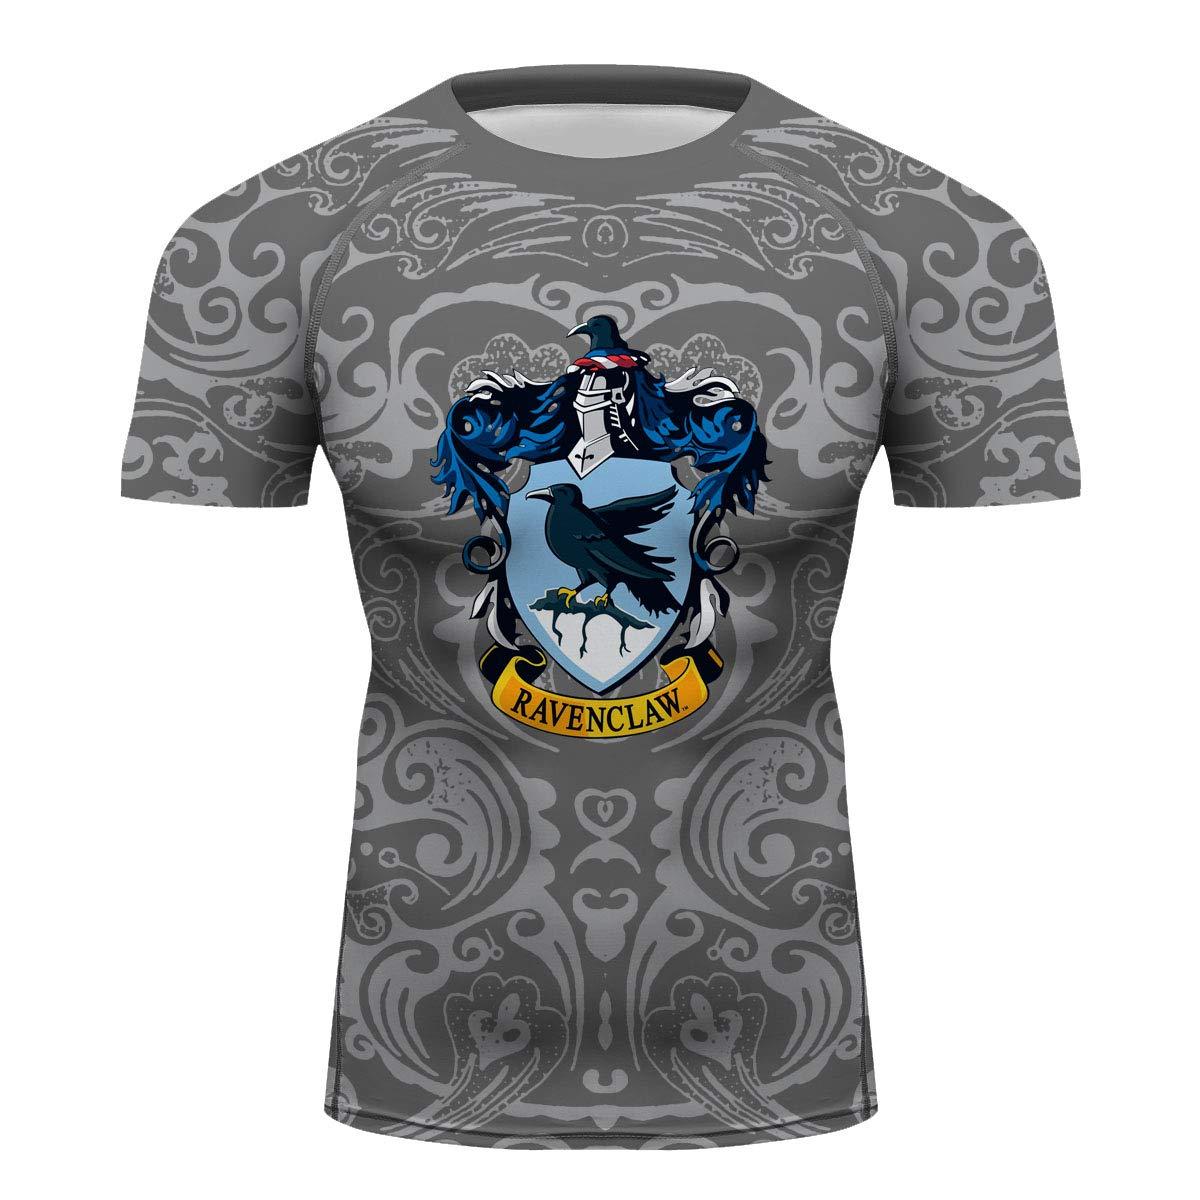 Men Body Building Tee Top Wrestling Cross Training House Ravenclaw Printing Singlet